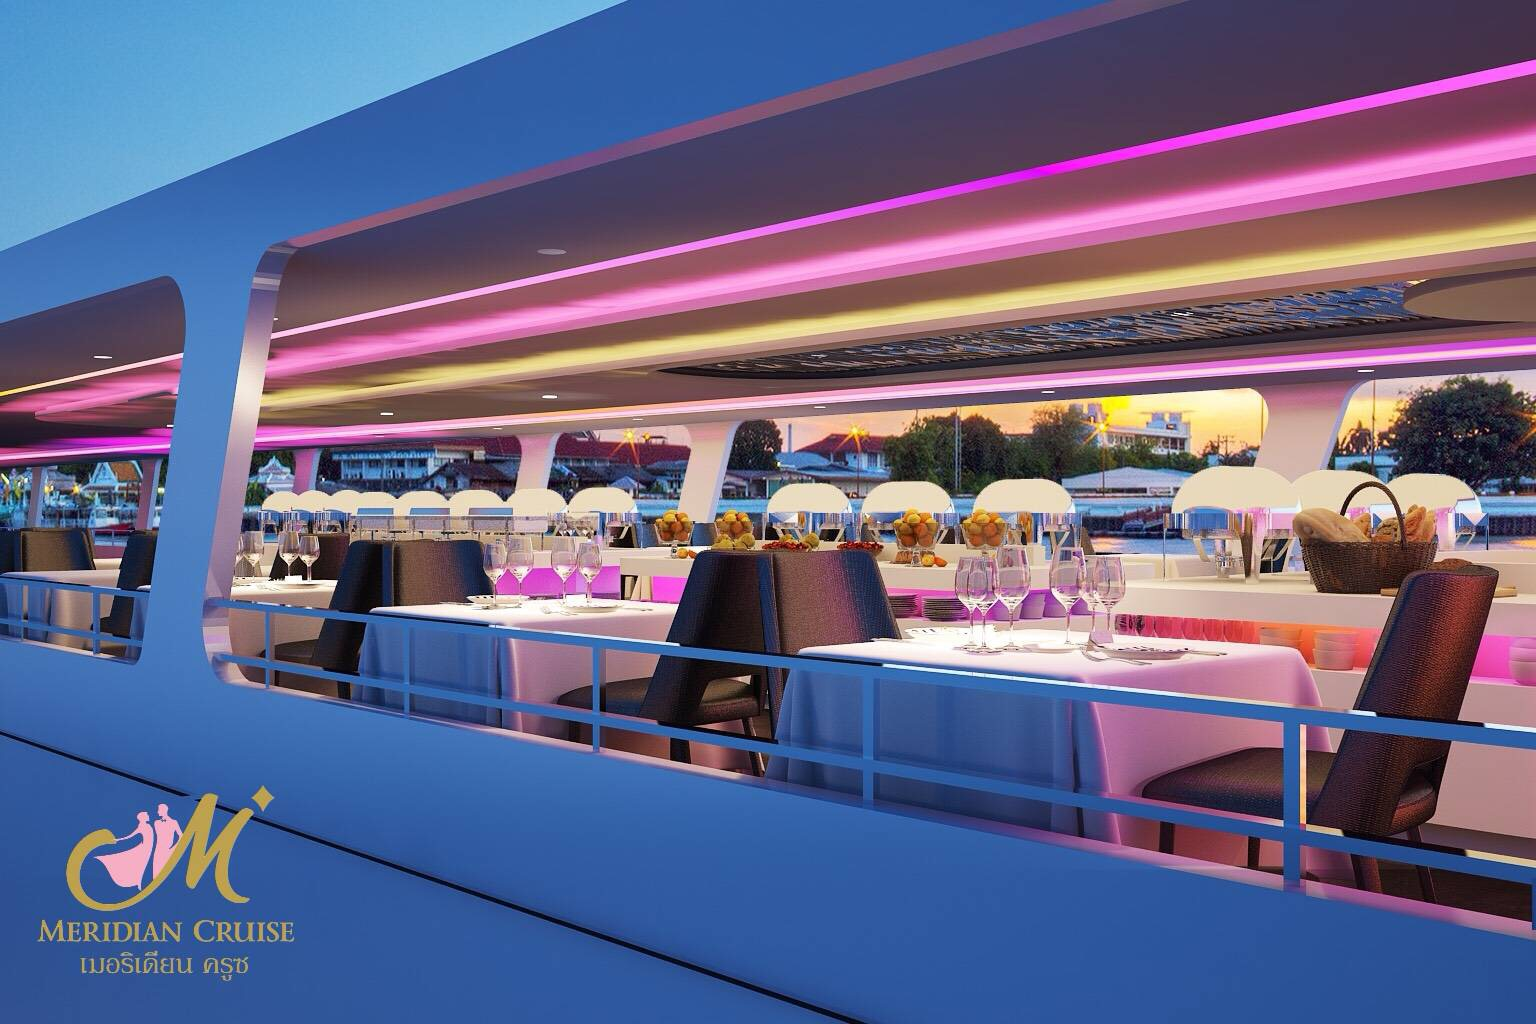 Meridian Cruise